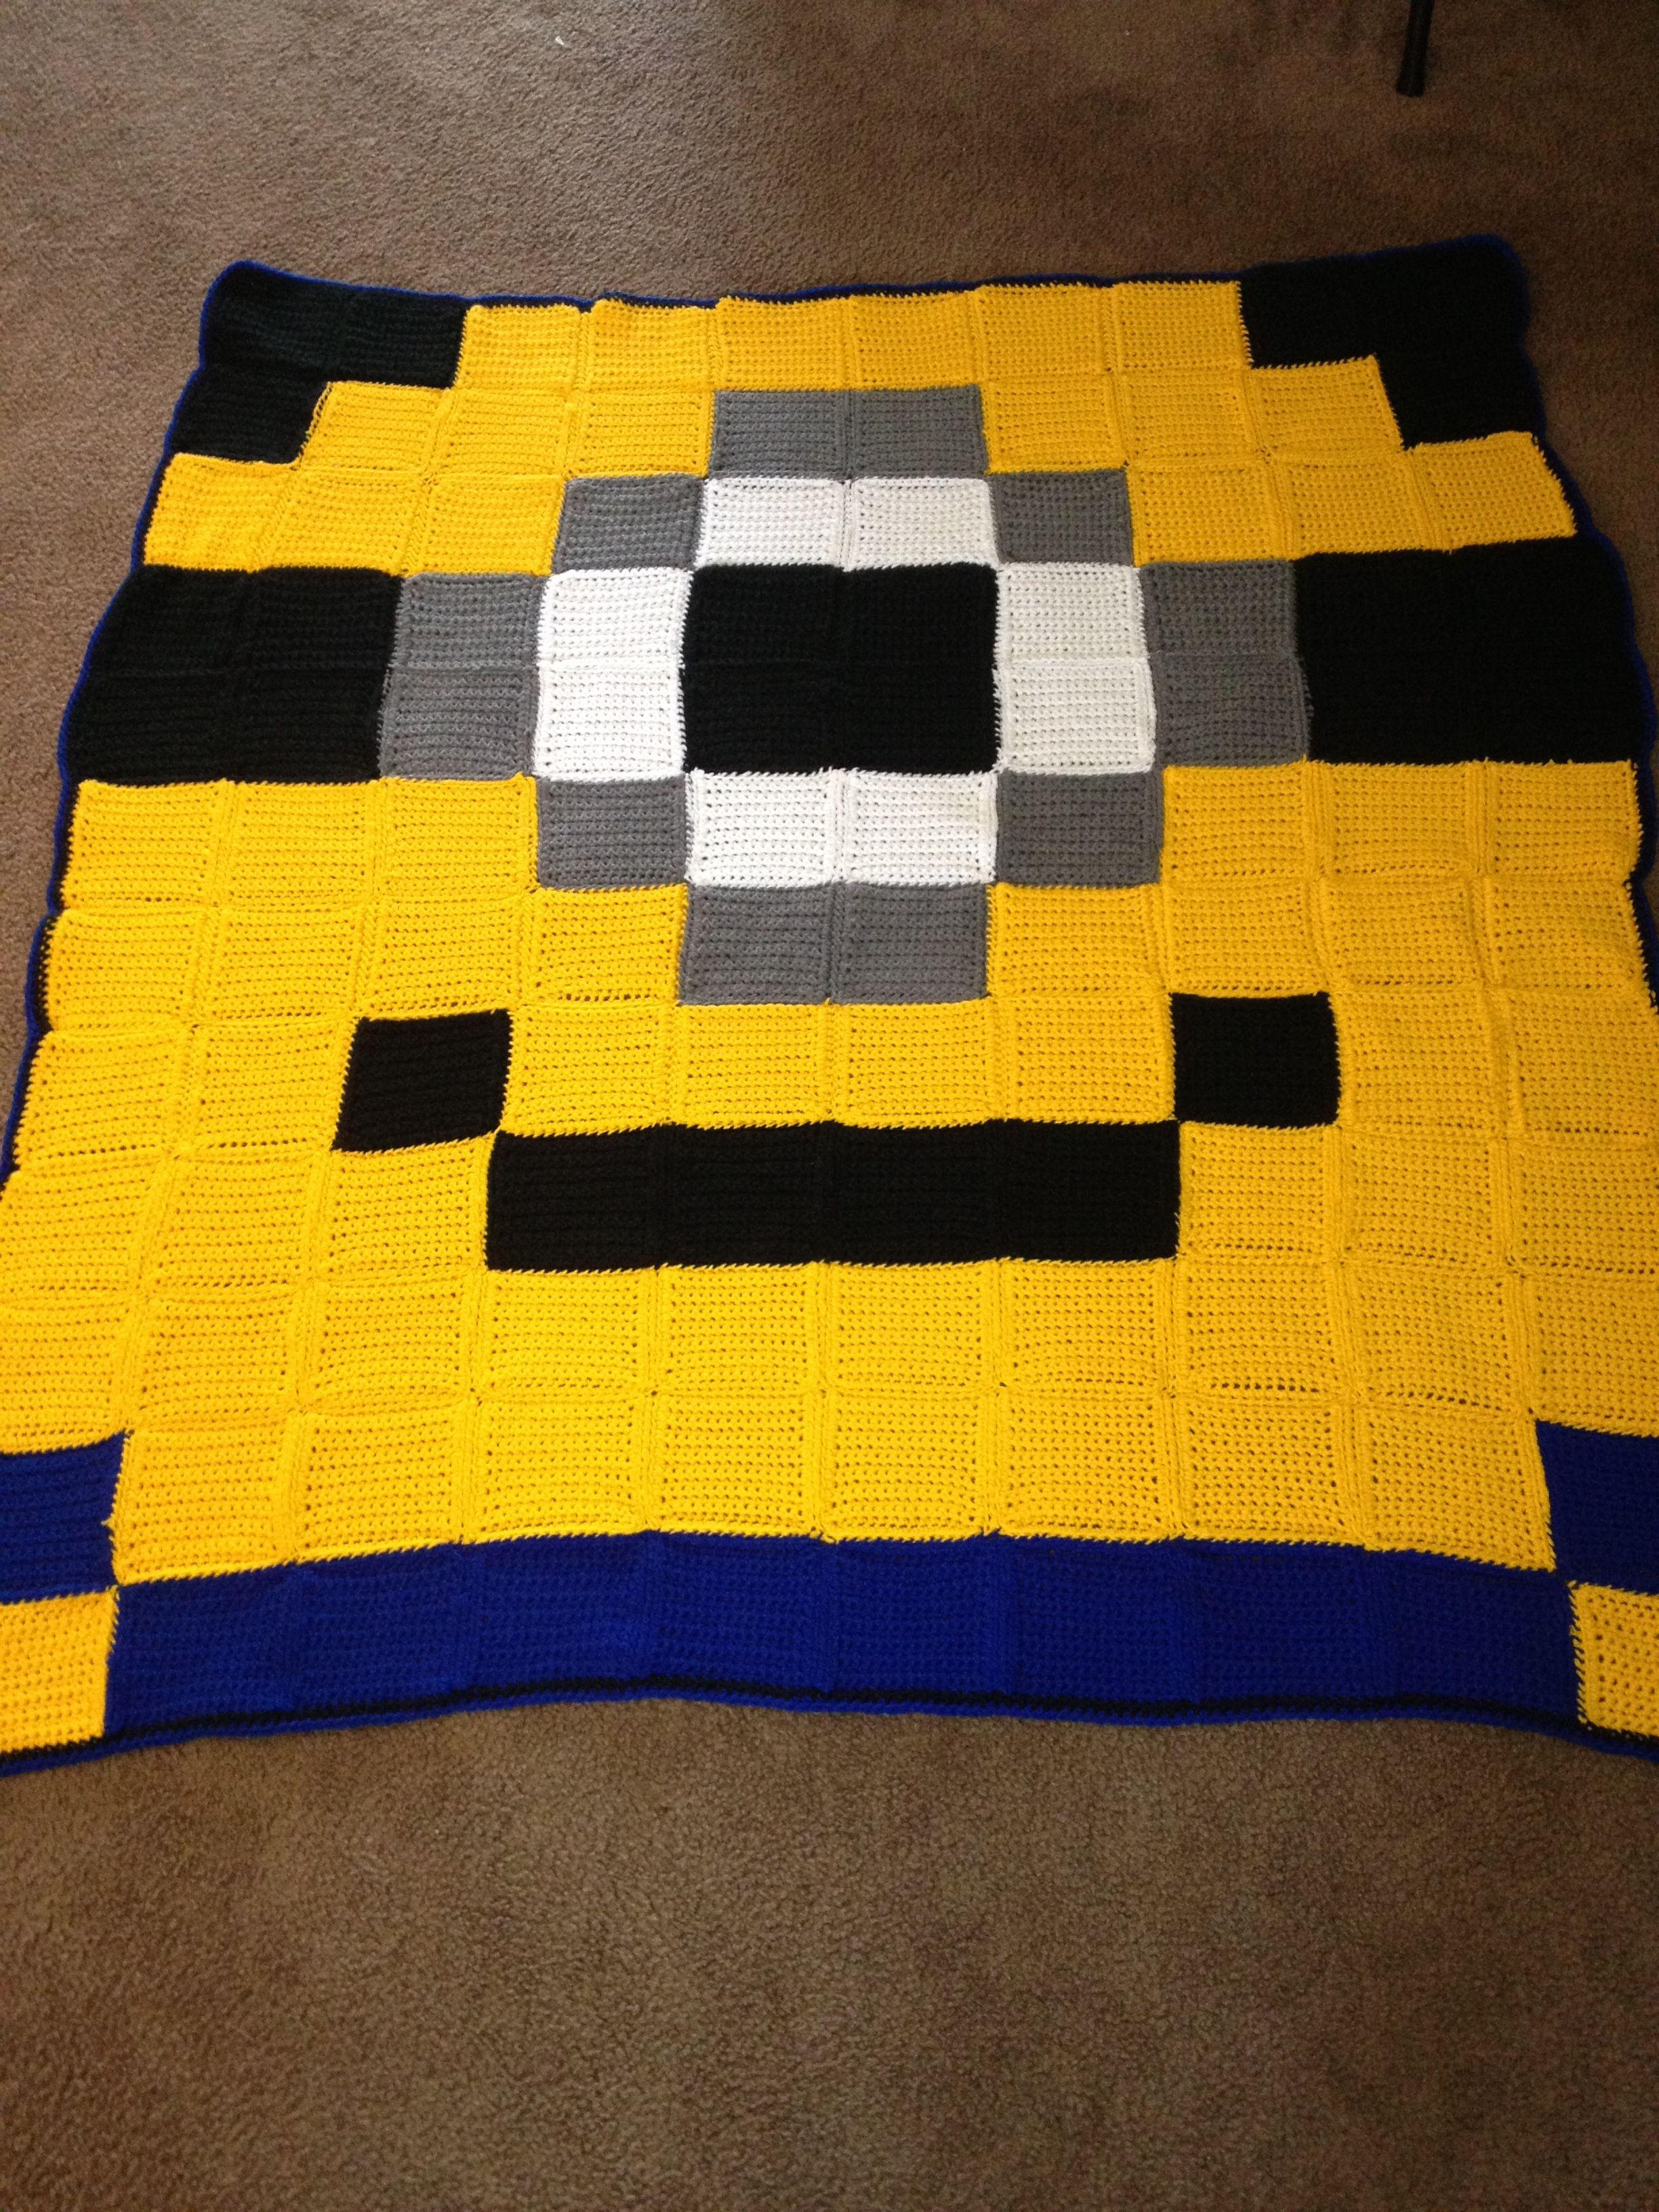 8Bit minion blanket | Crochet By CiCi | Pinterest | Bügelperlen ...